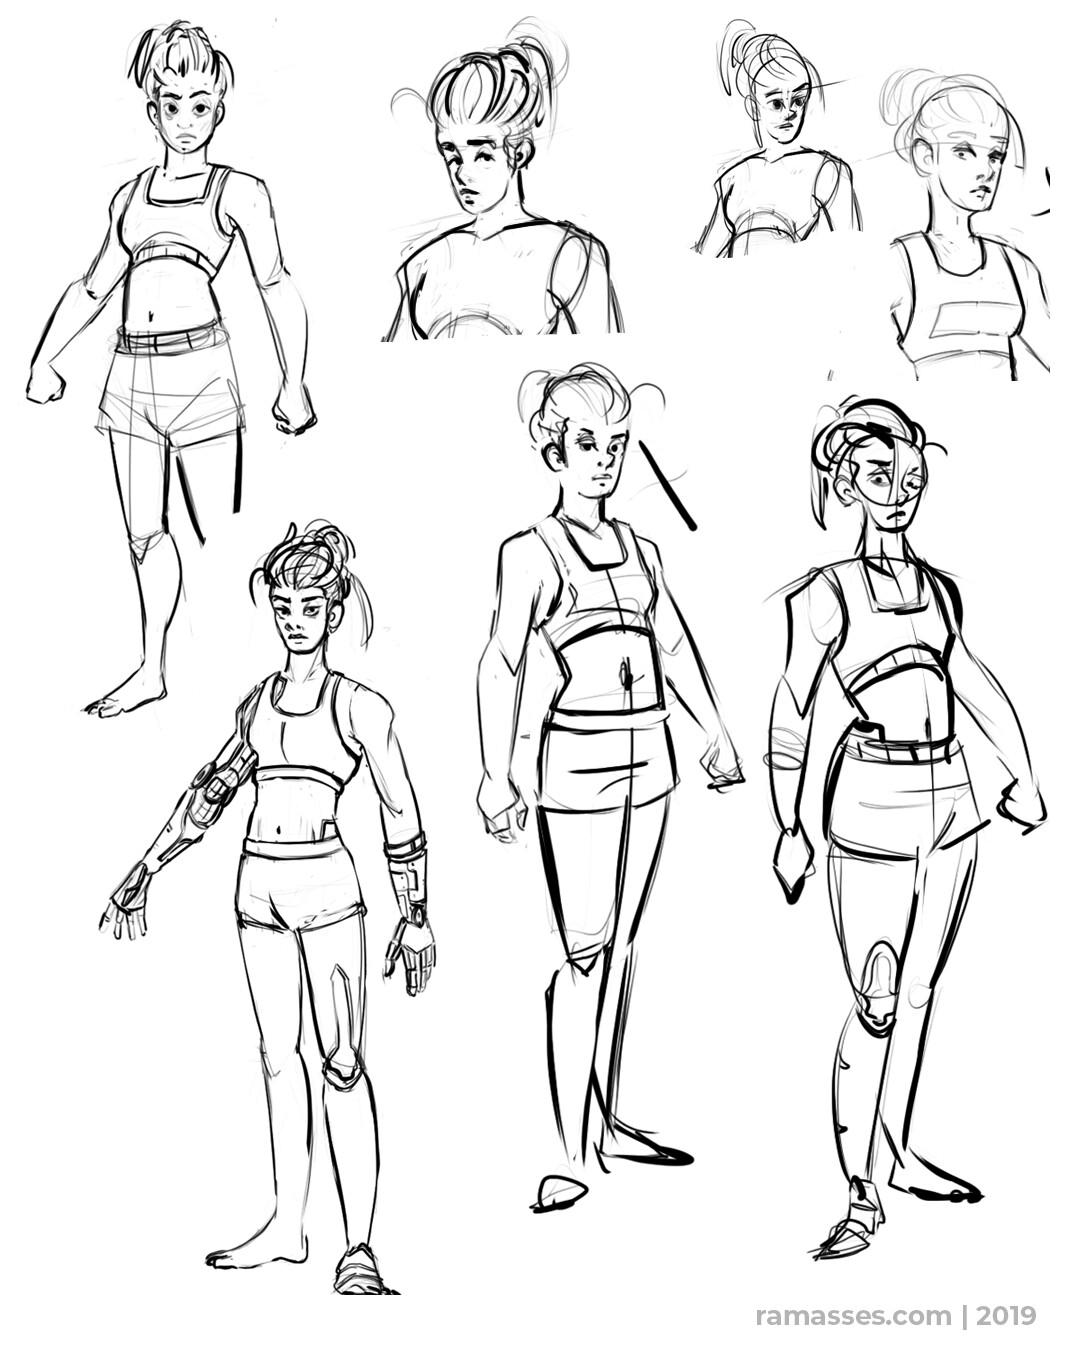 Ramasses romero cyborgfighter sketch02